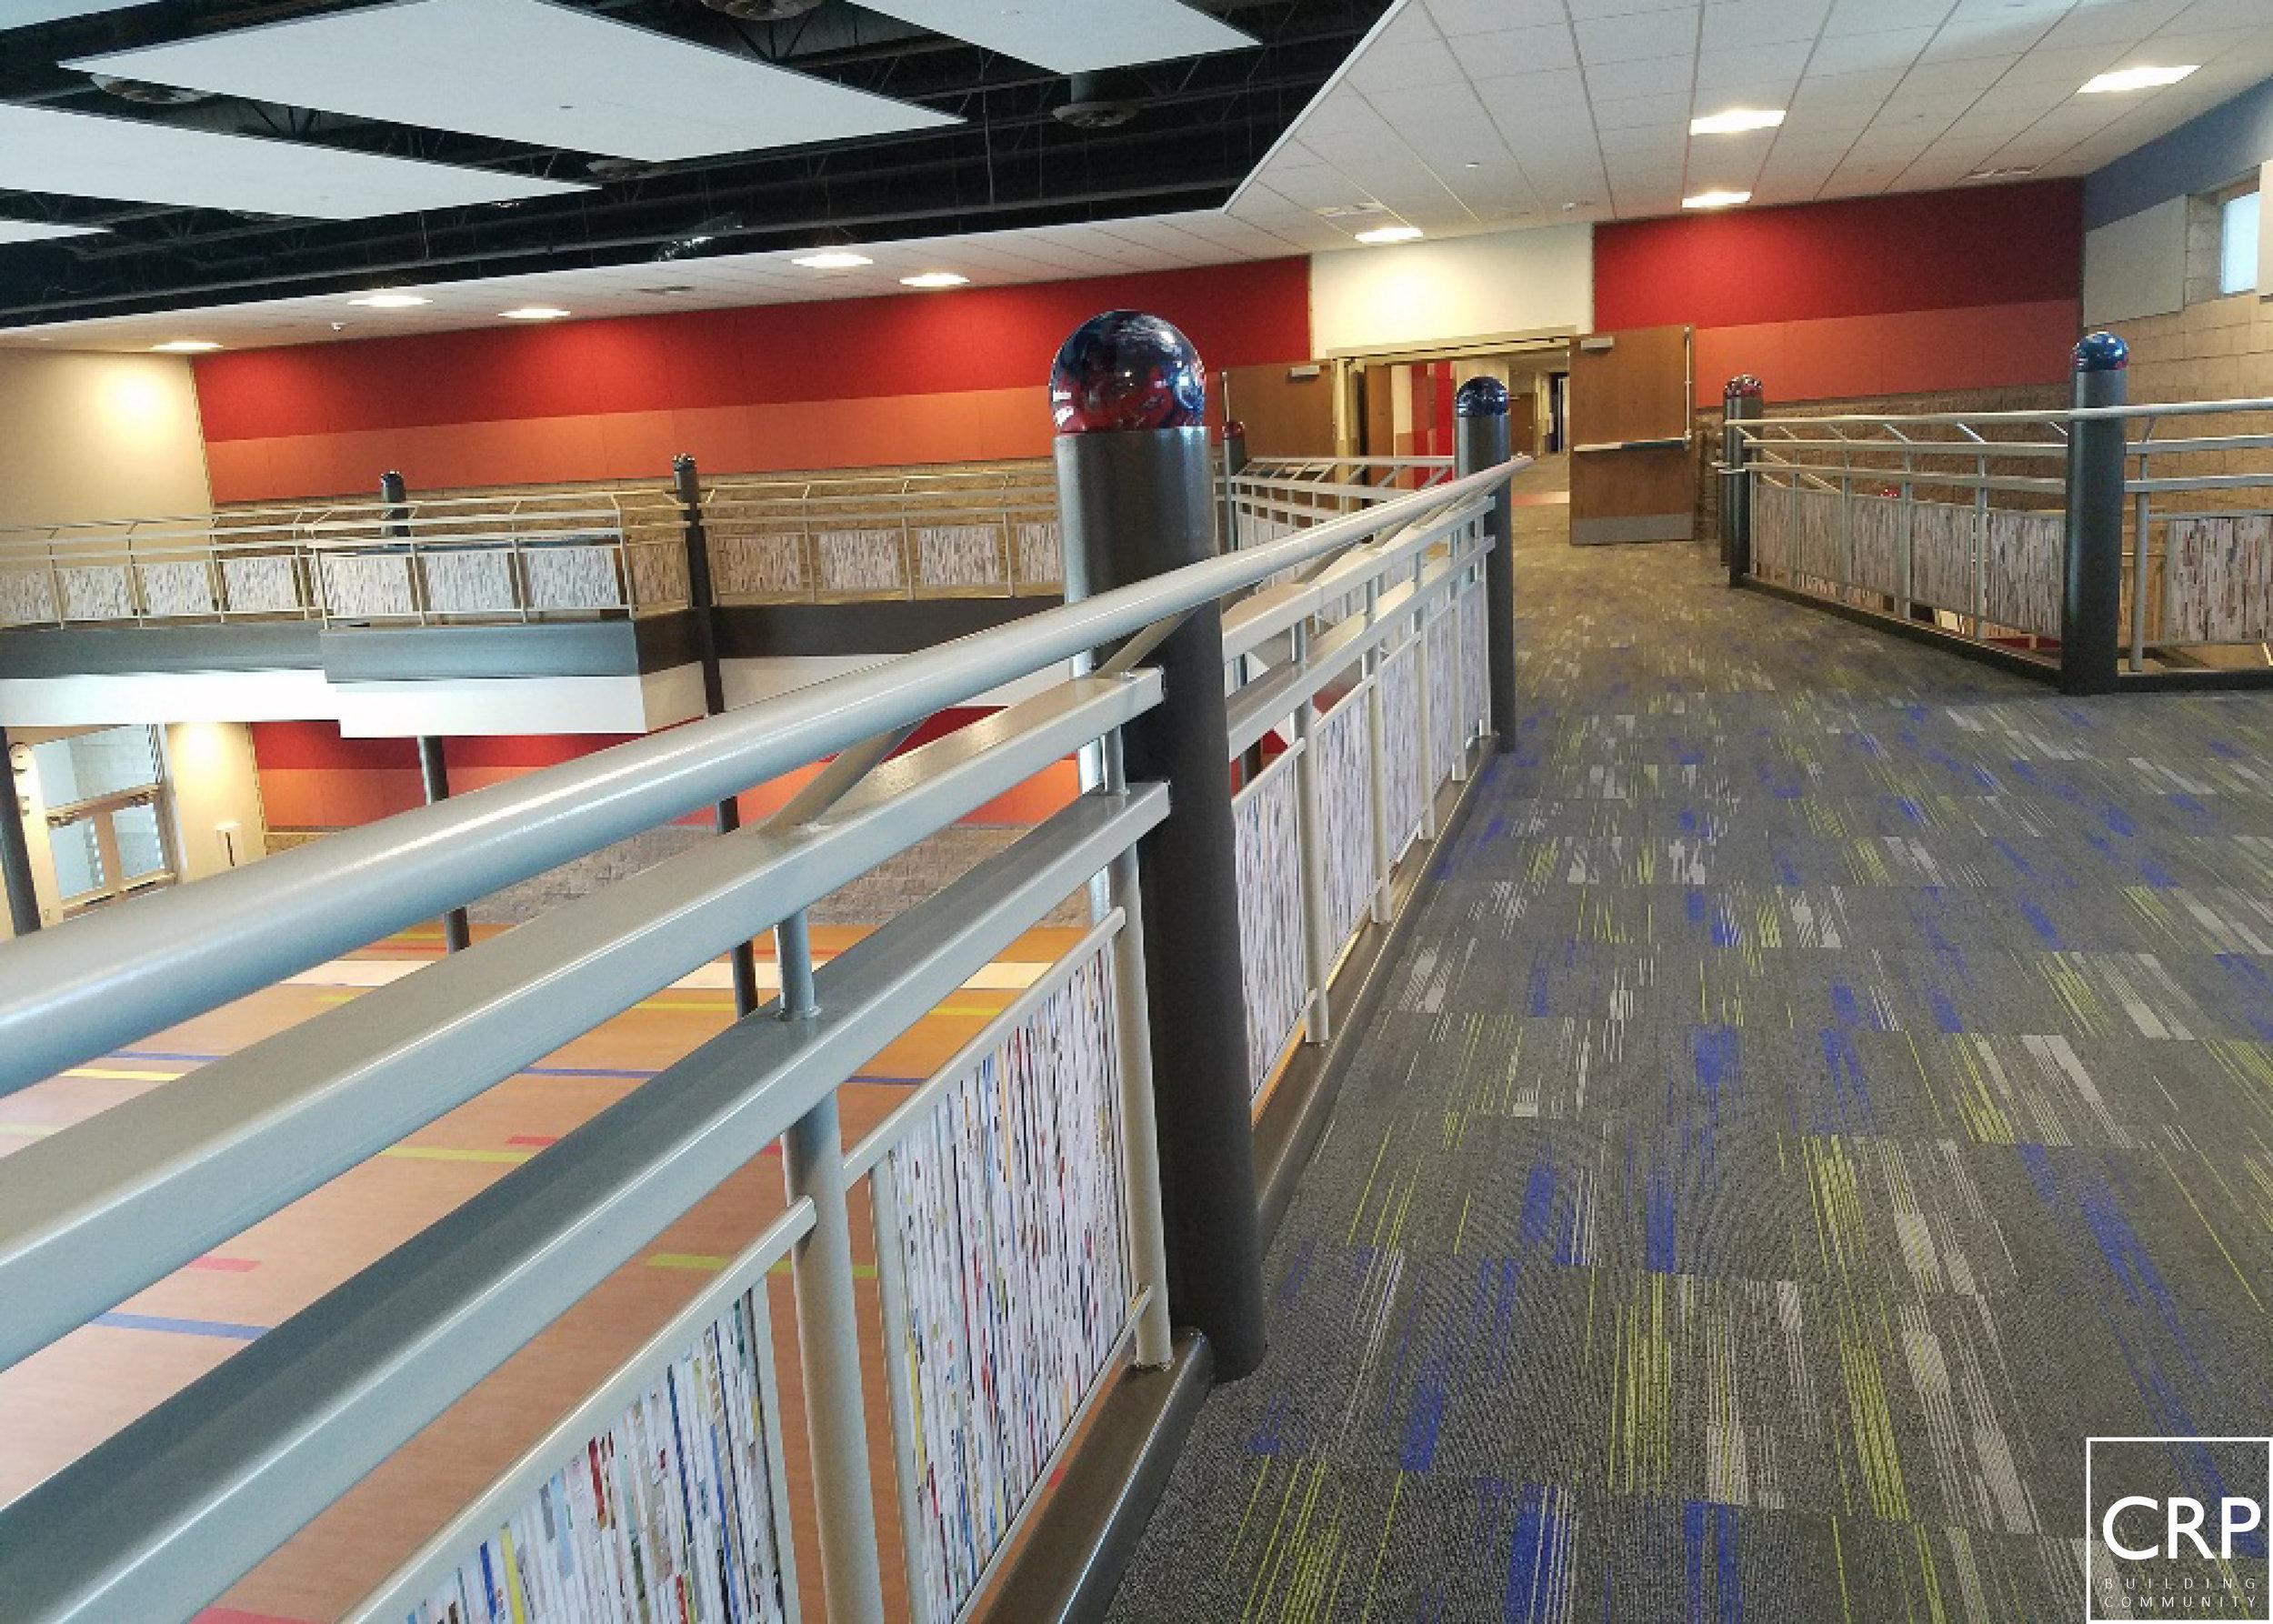 CRP Bowling Stair 4.jpg